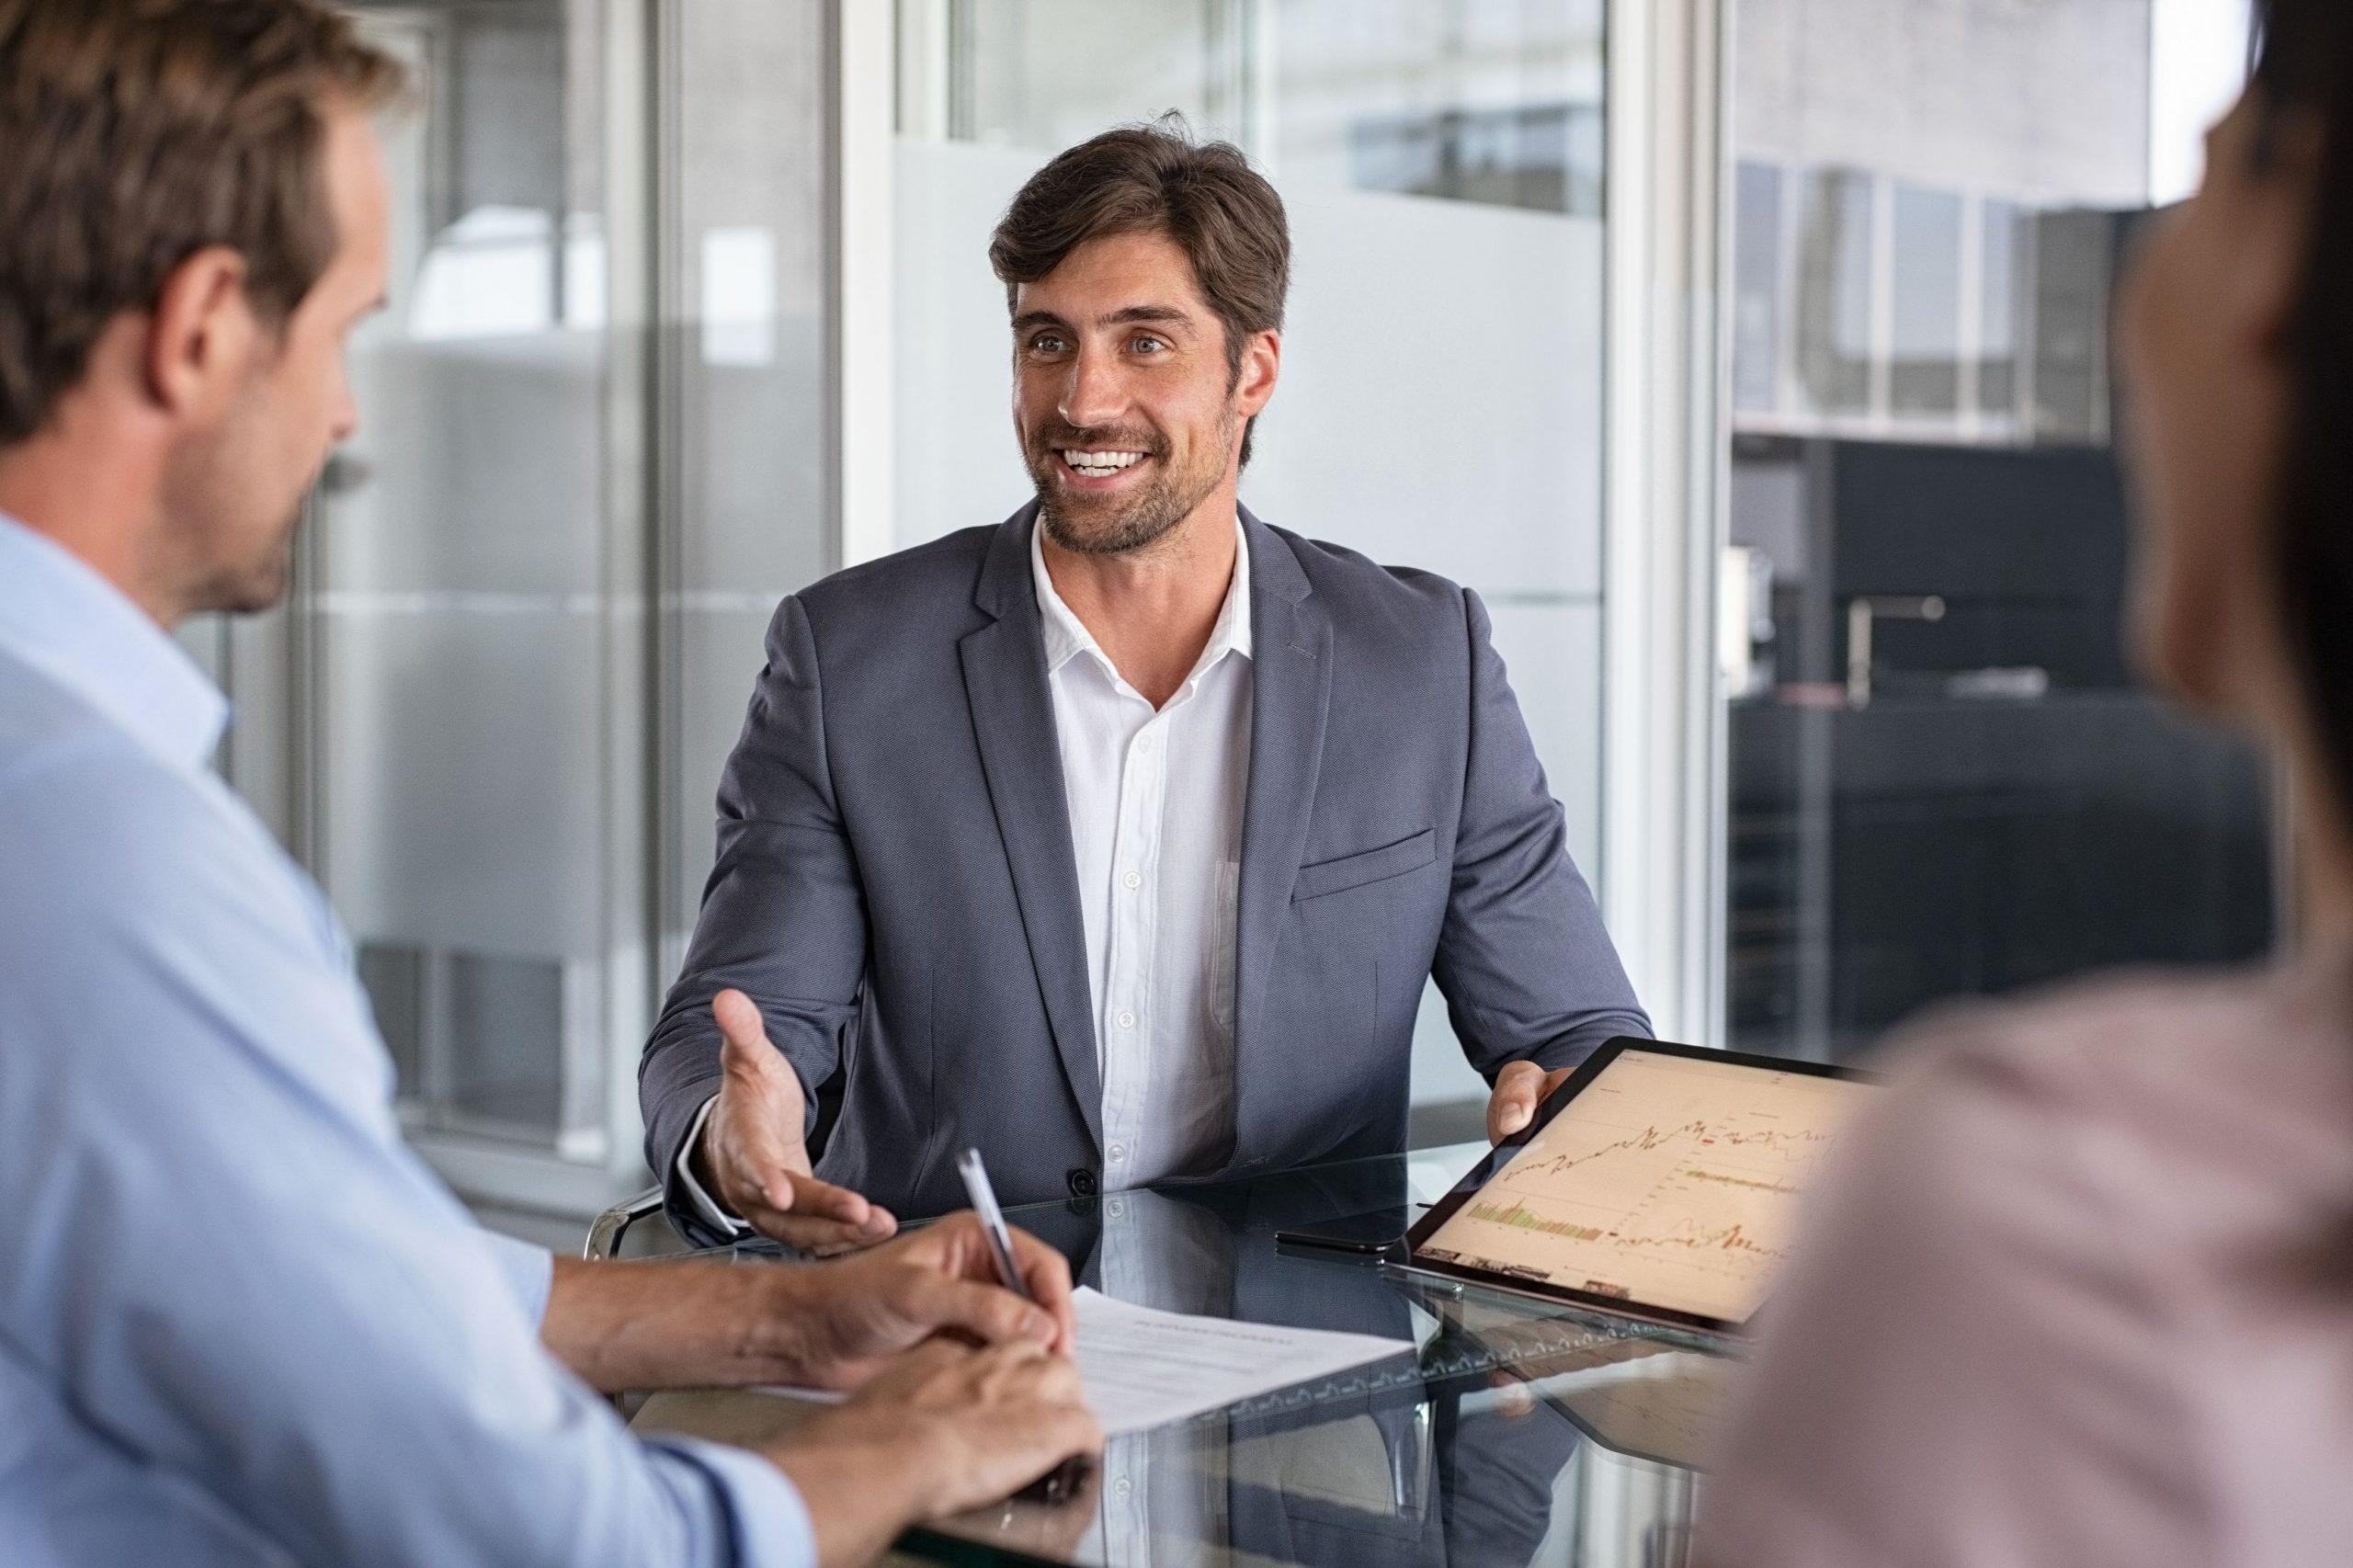 conseiller financier formation 2020